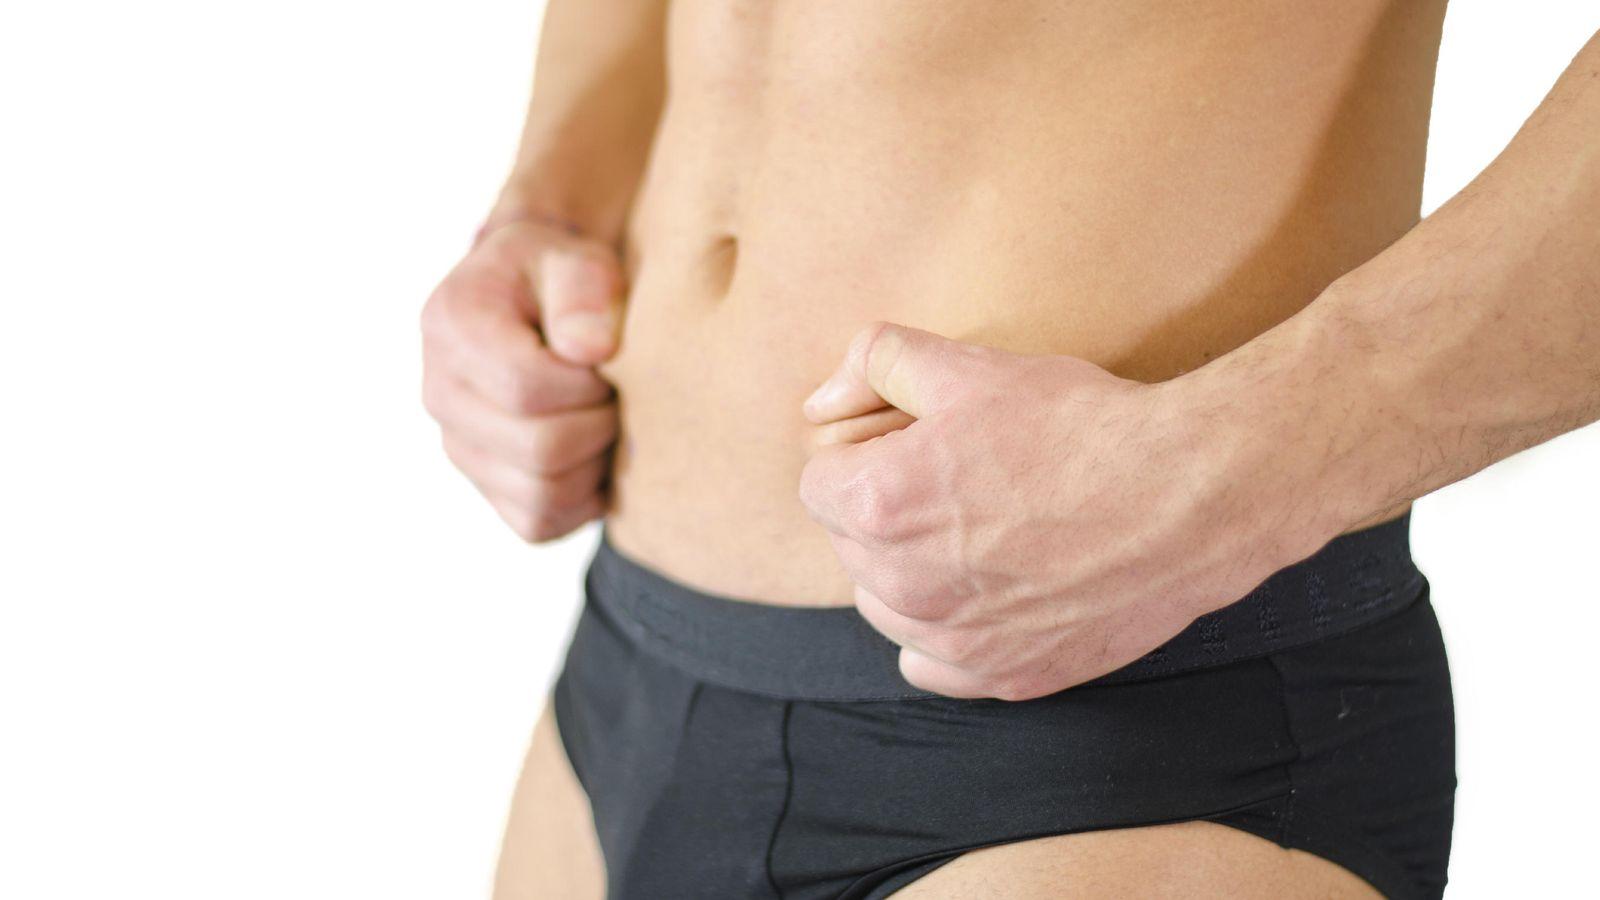 Foro Orlistat , La píldora que elimina grasas